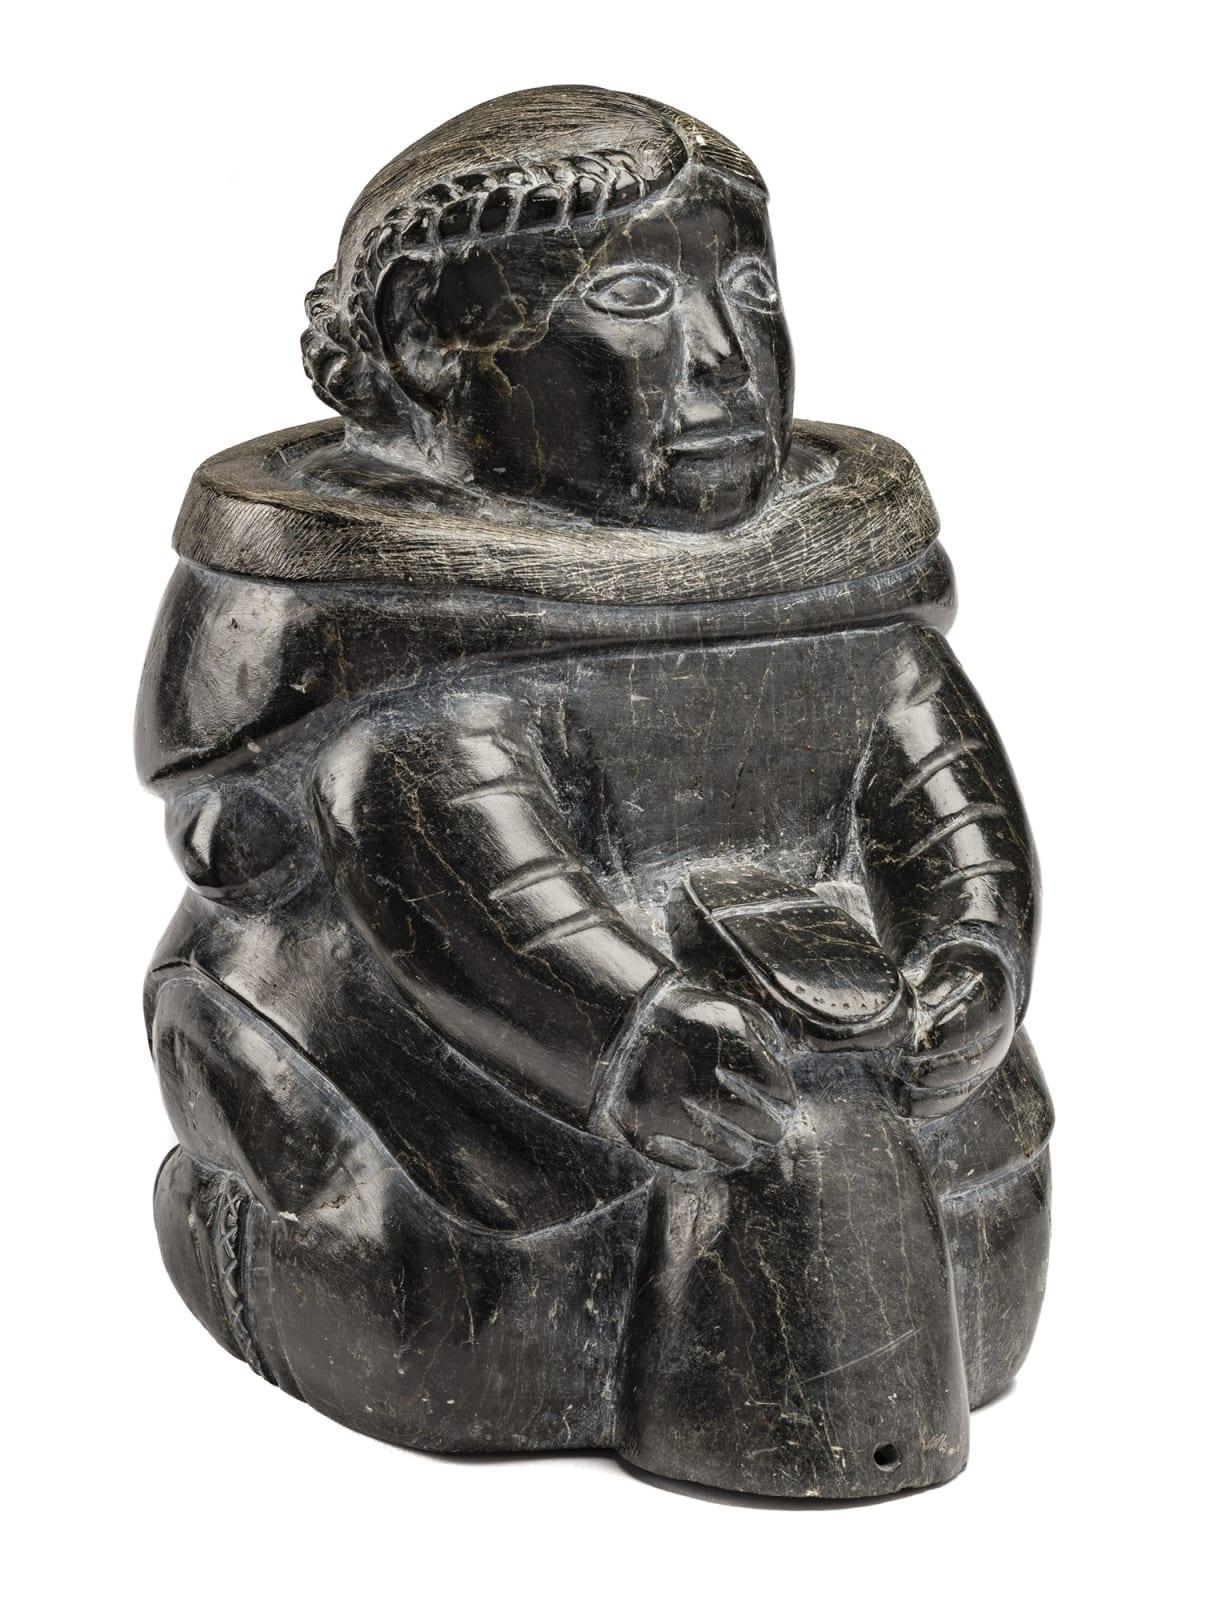 Lot 102 SARAH MEEKO NASTAPOKA (1925-d) INUKJUAK (PORT HARRISON Kneeling Woman Mending A Kamik, c. early 1960s stone, 12.5 x 7.25 x 9.5 in (31.8 x 18.4 x 24.1 cm) Estimate: $6,000— $9,000